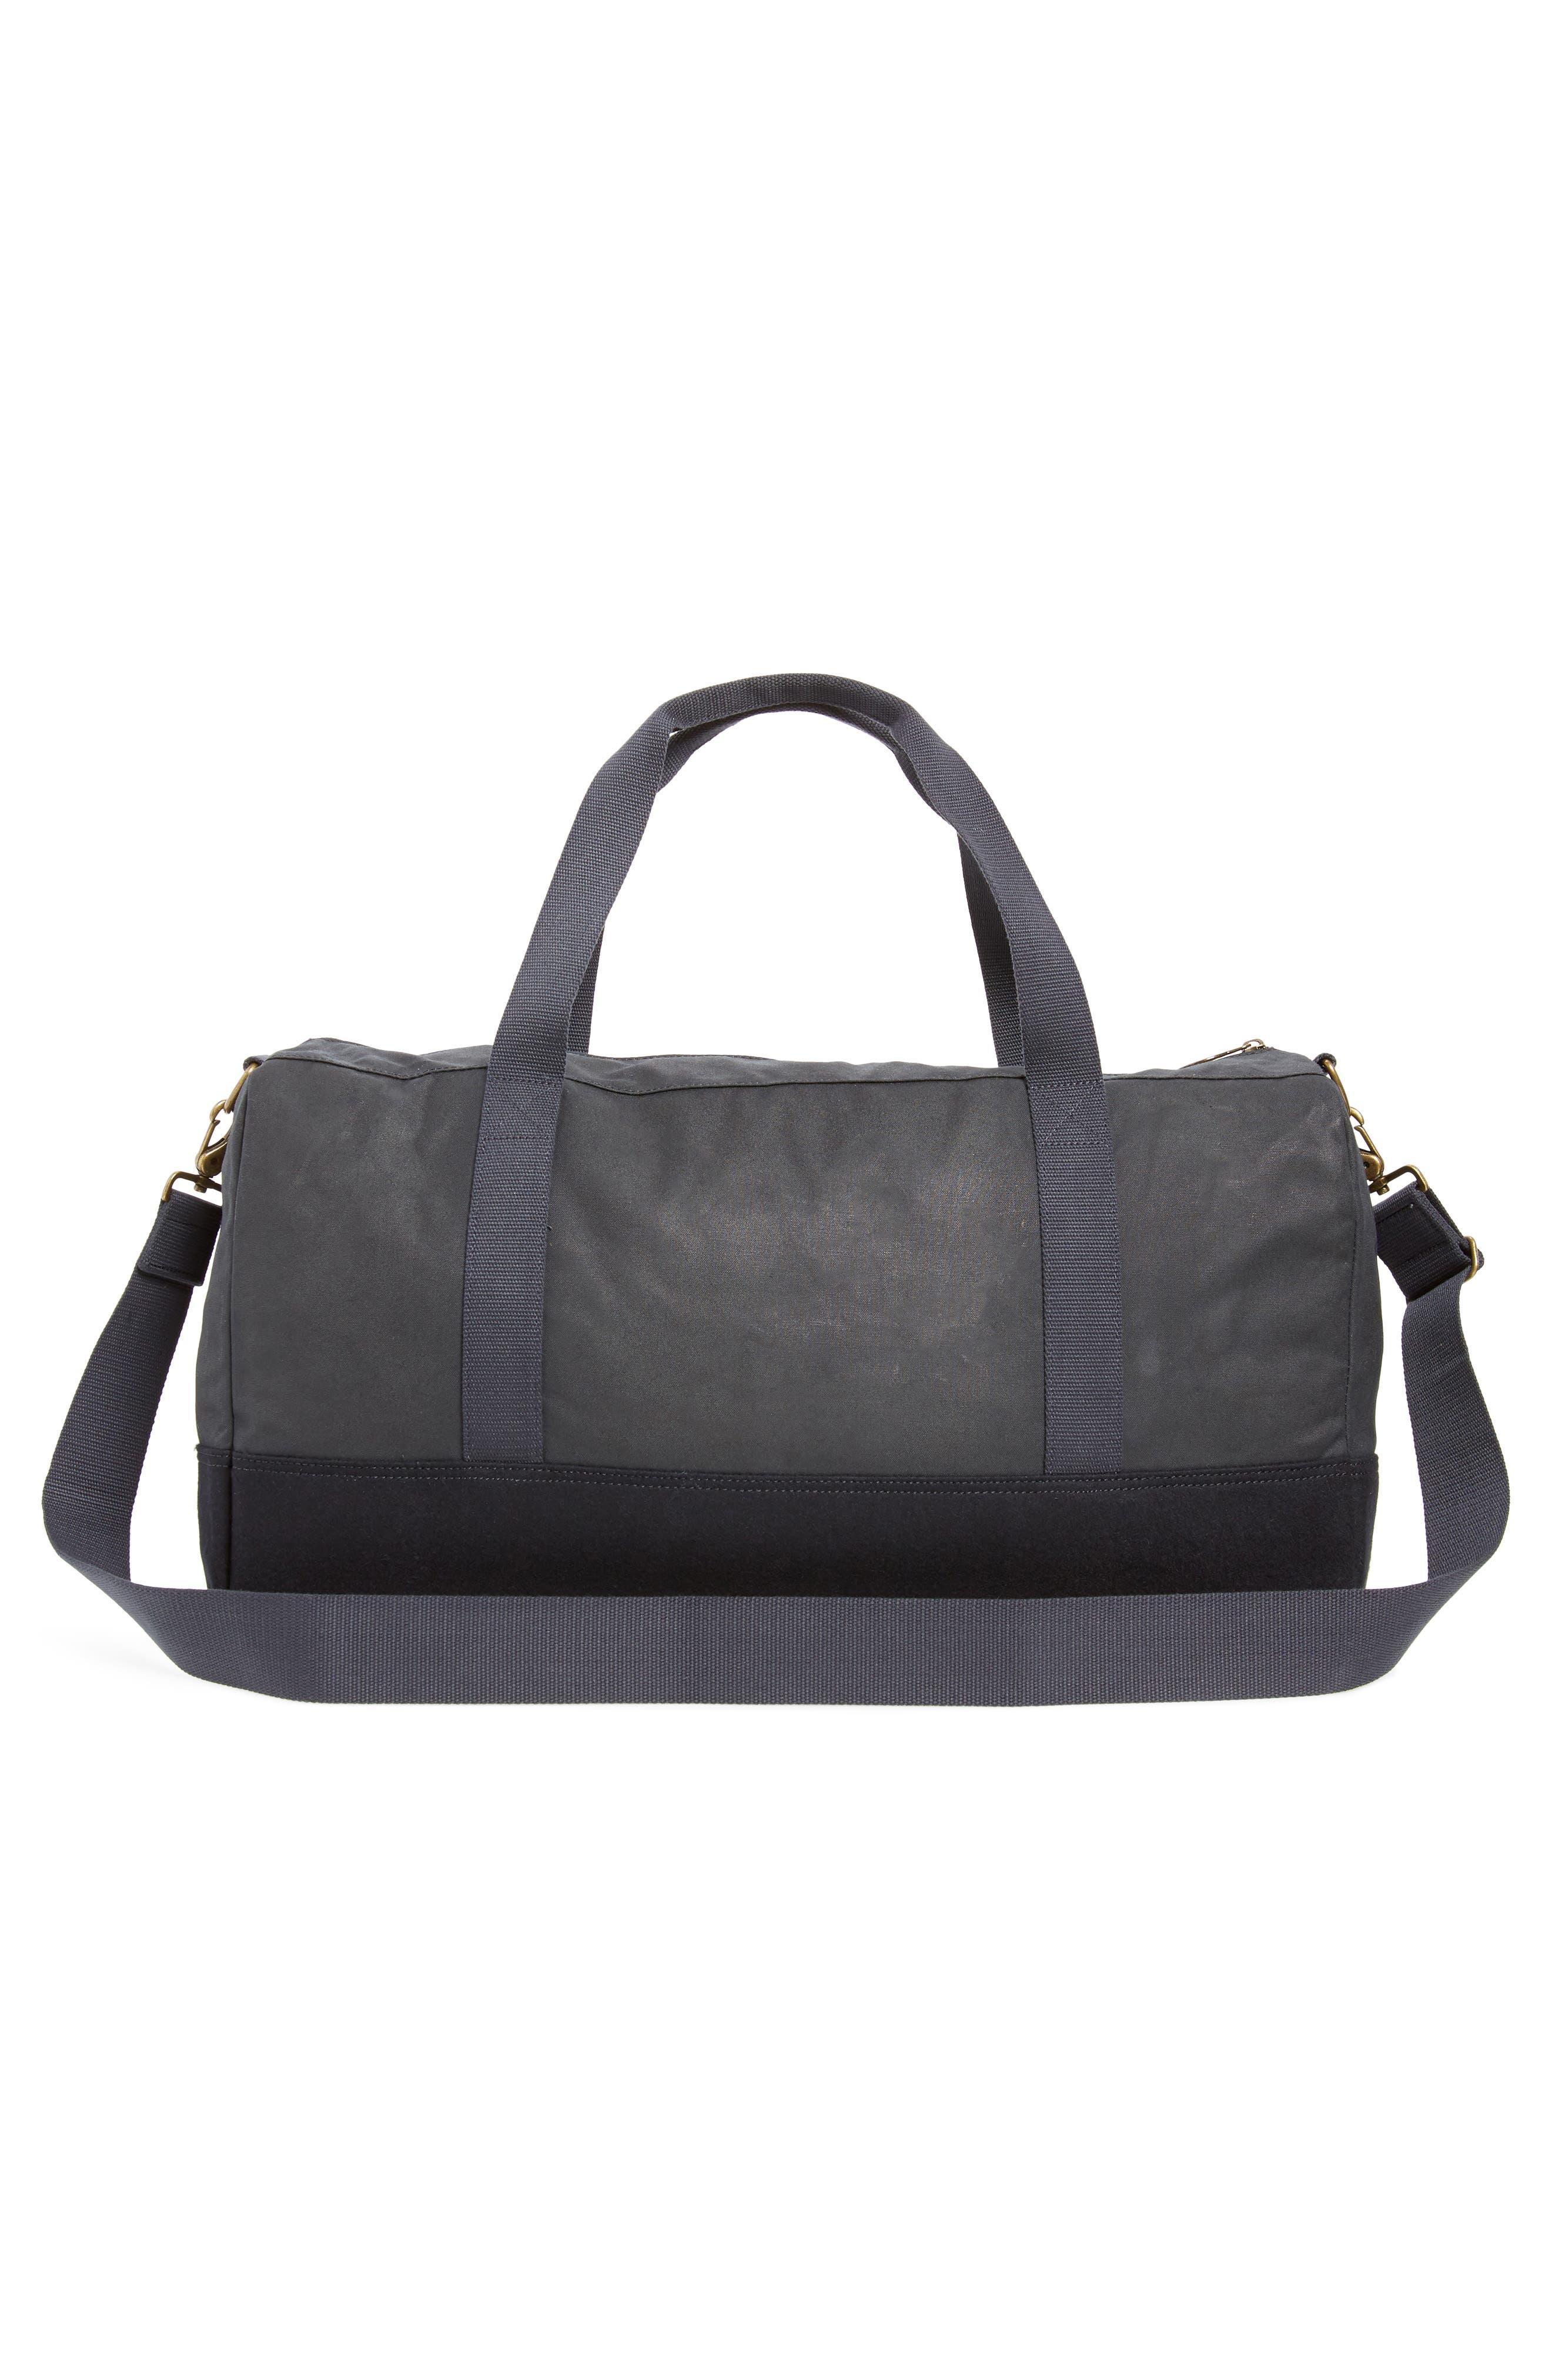 Gisburne Duffel Bag,                             Alternate thumbnail 3, color,                             400